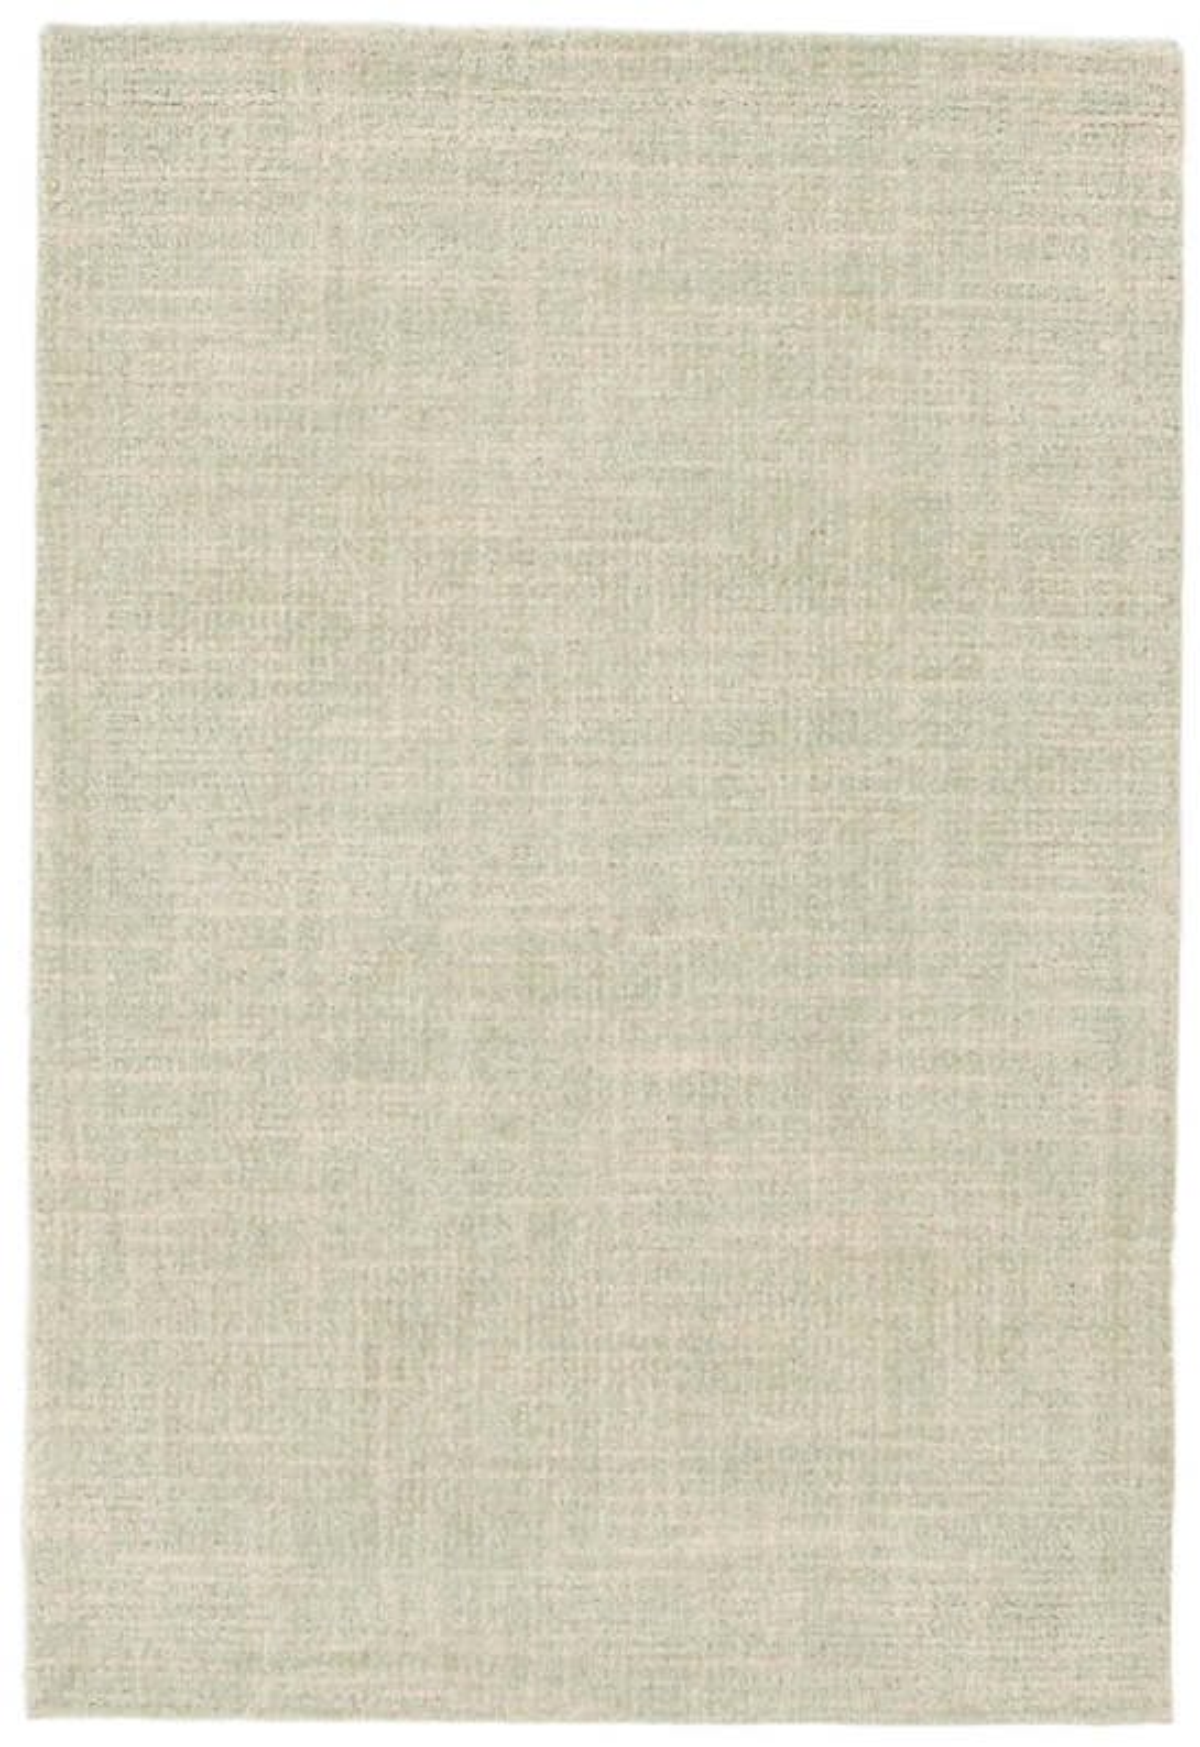 Crosshatch Celadon Wool Micro Hooked Rug